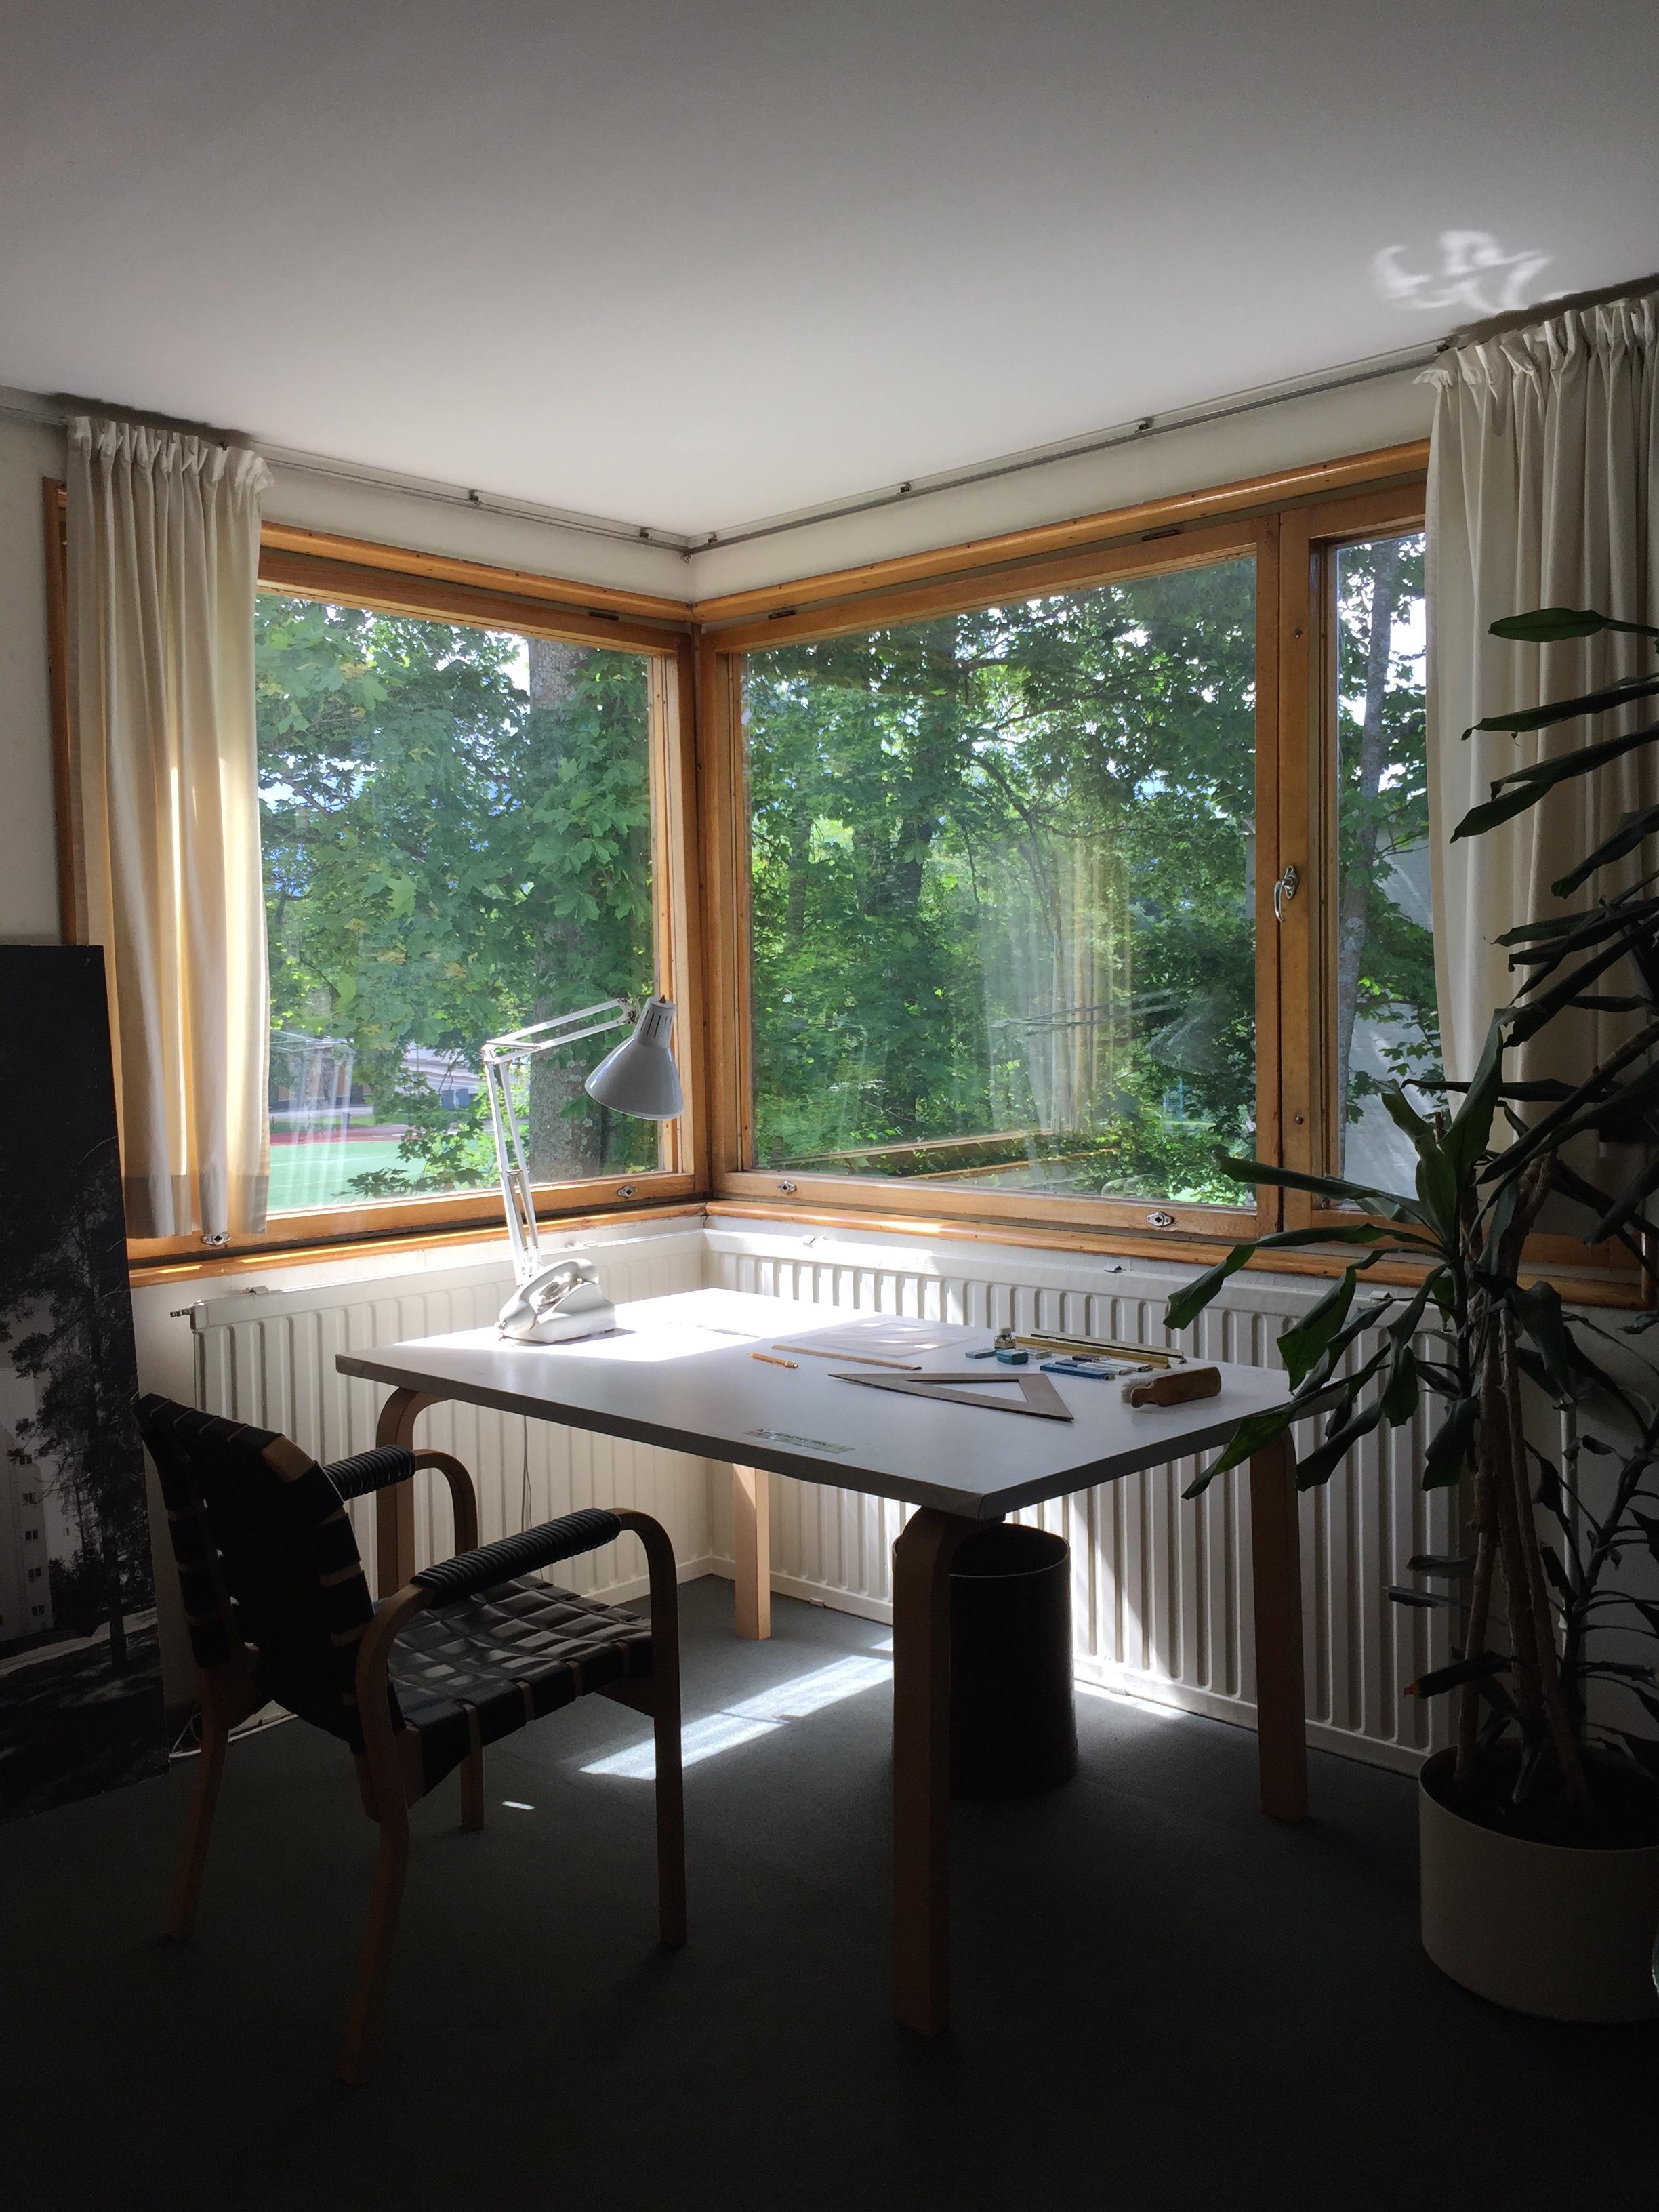 Aalto's home studio desk / Aalto House / 11 July 2015